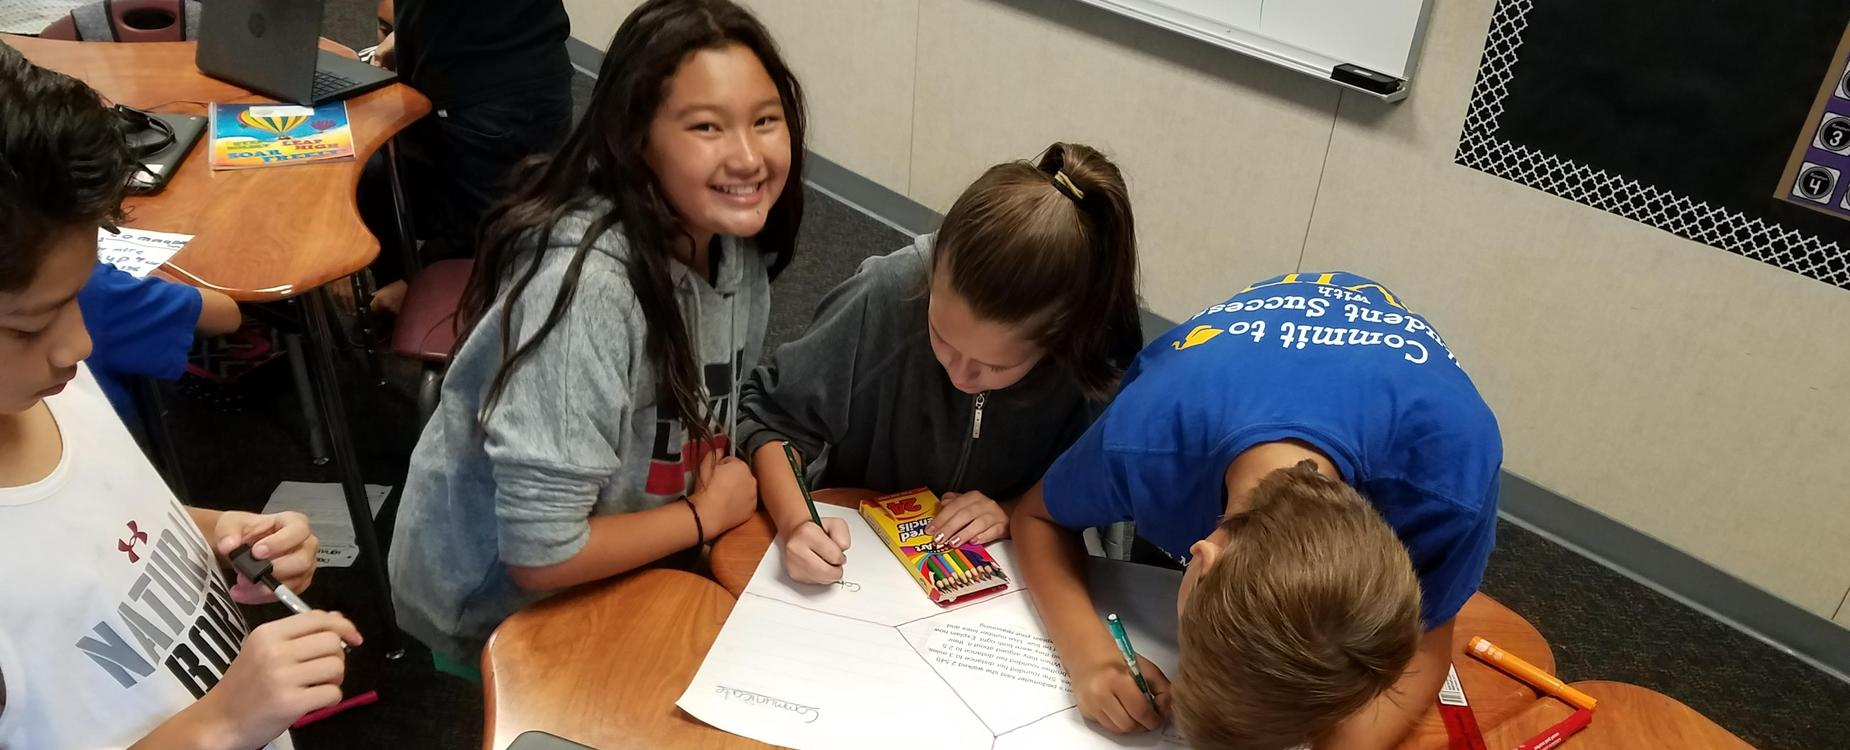 students working on AVID strategies